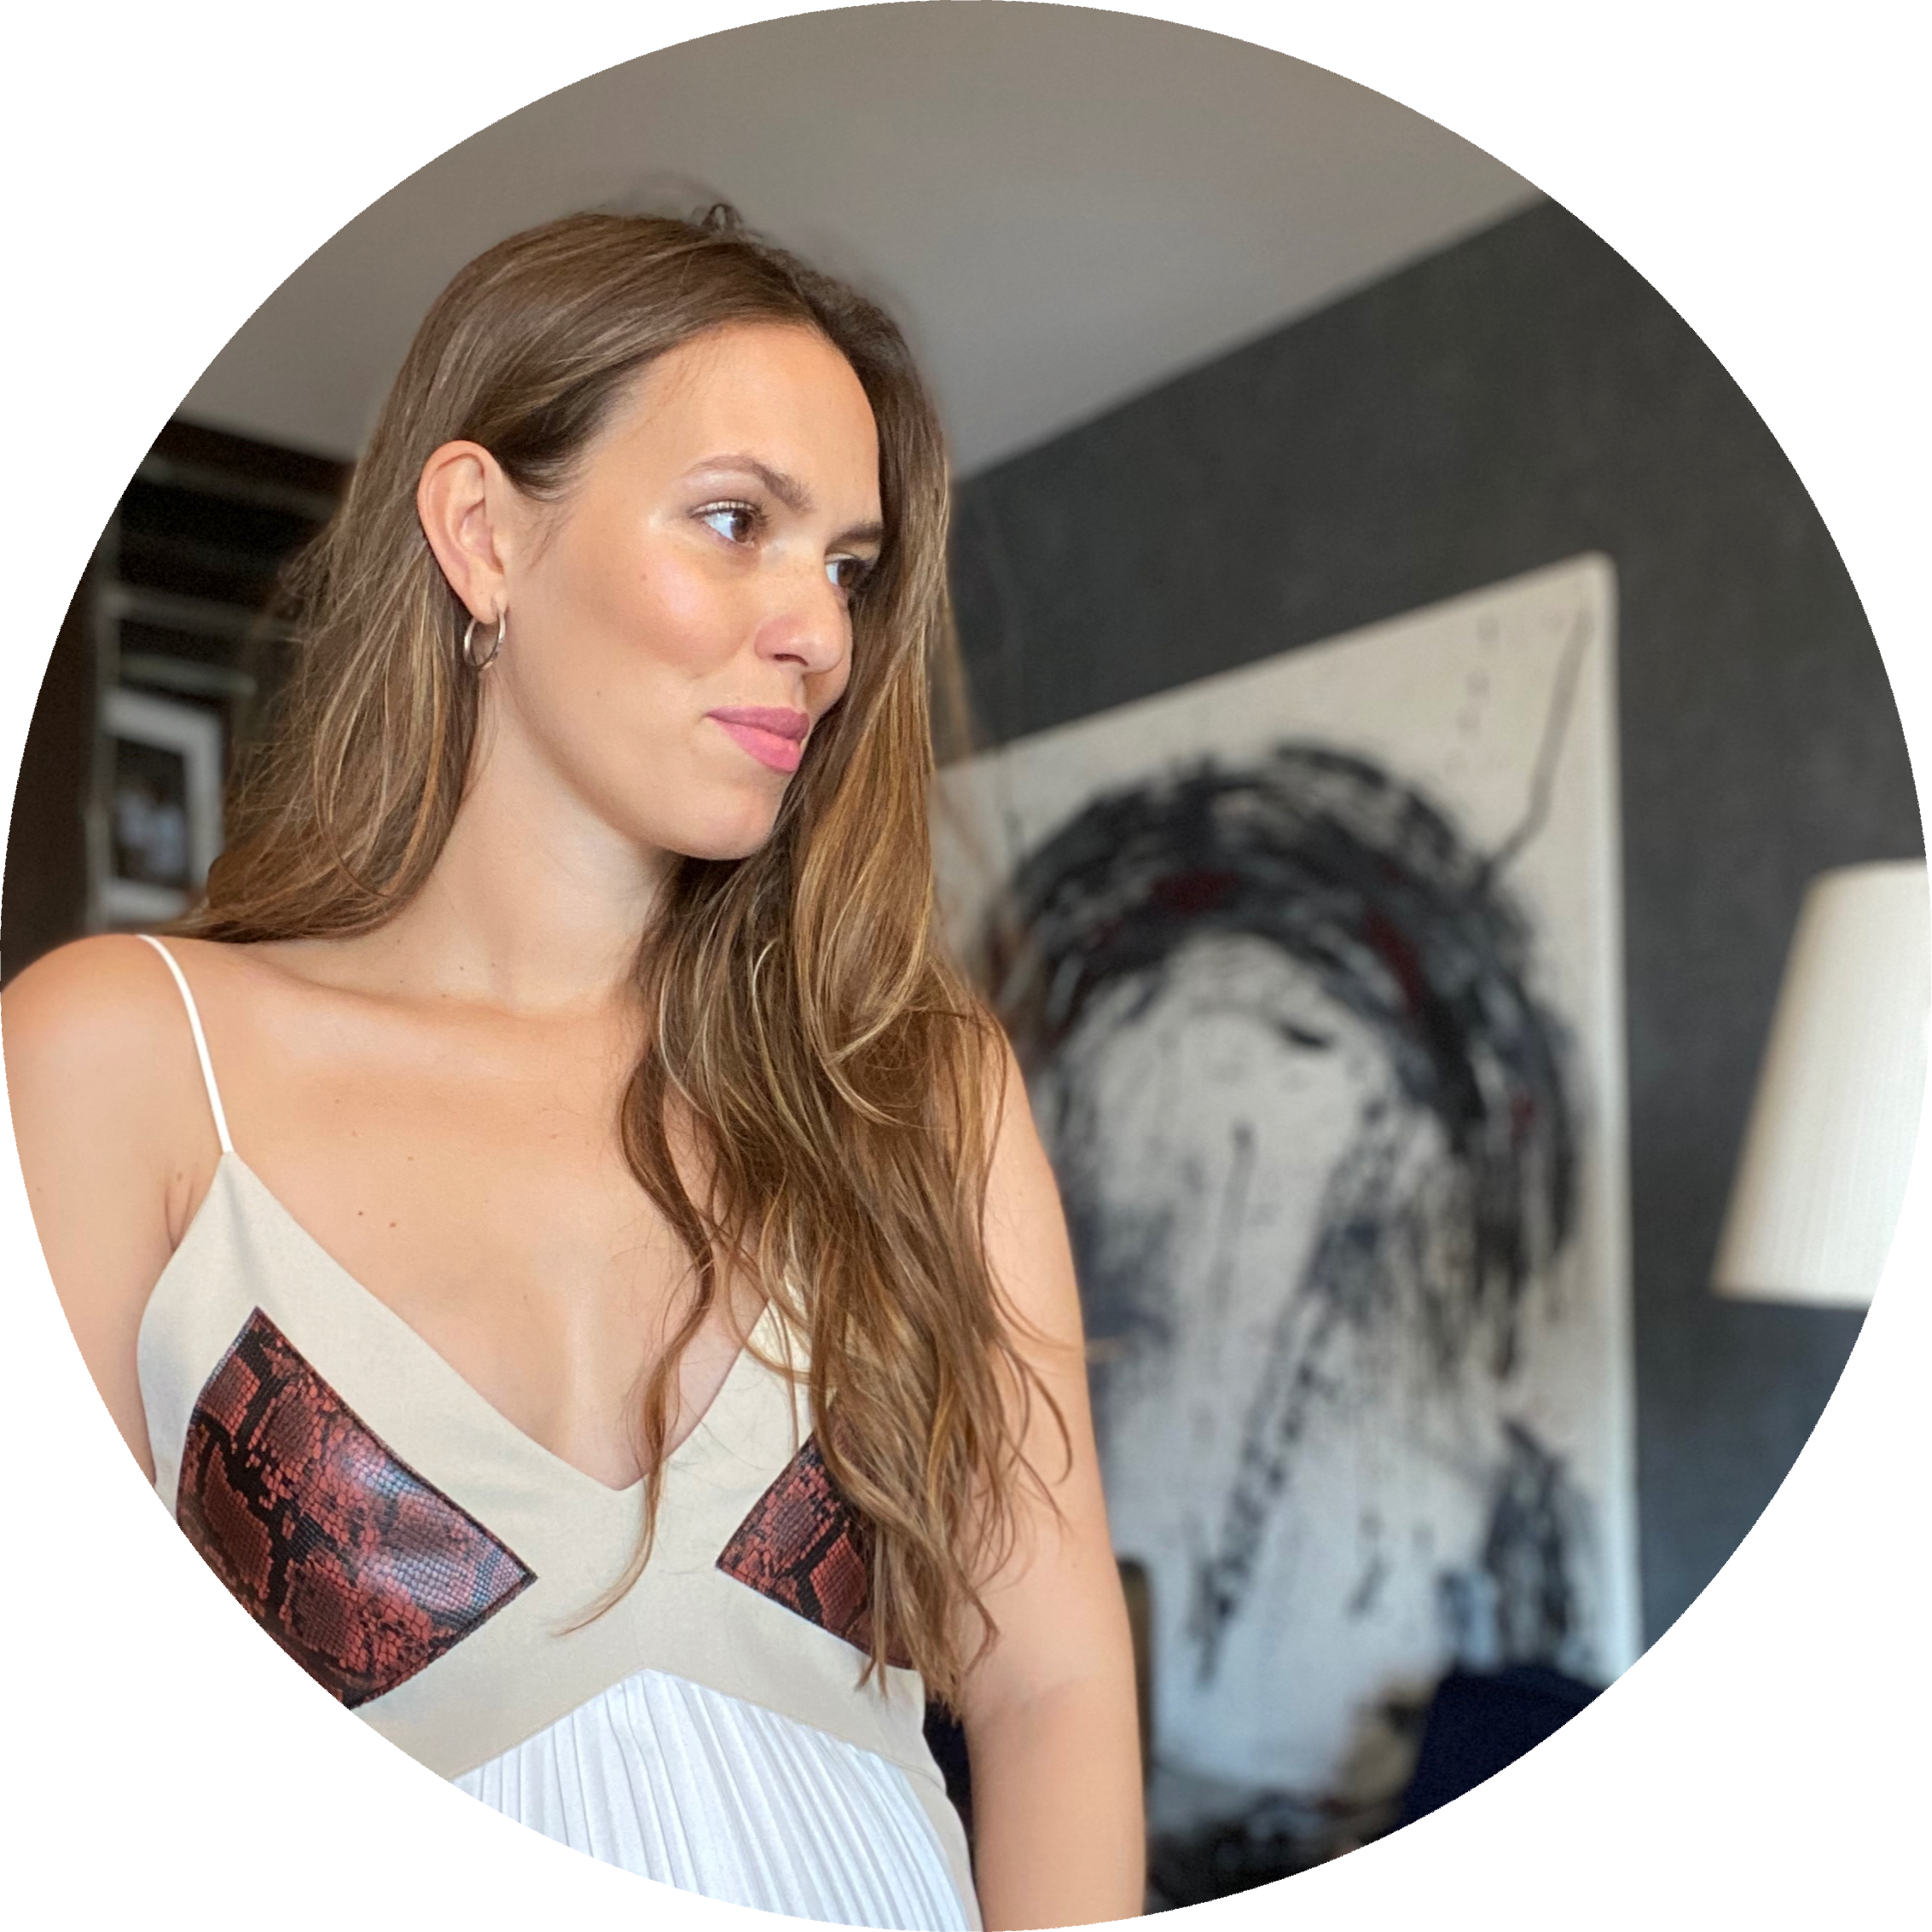 @alex.bezmarevic Profile Image | Linktree